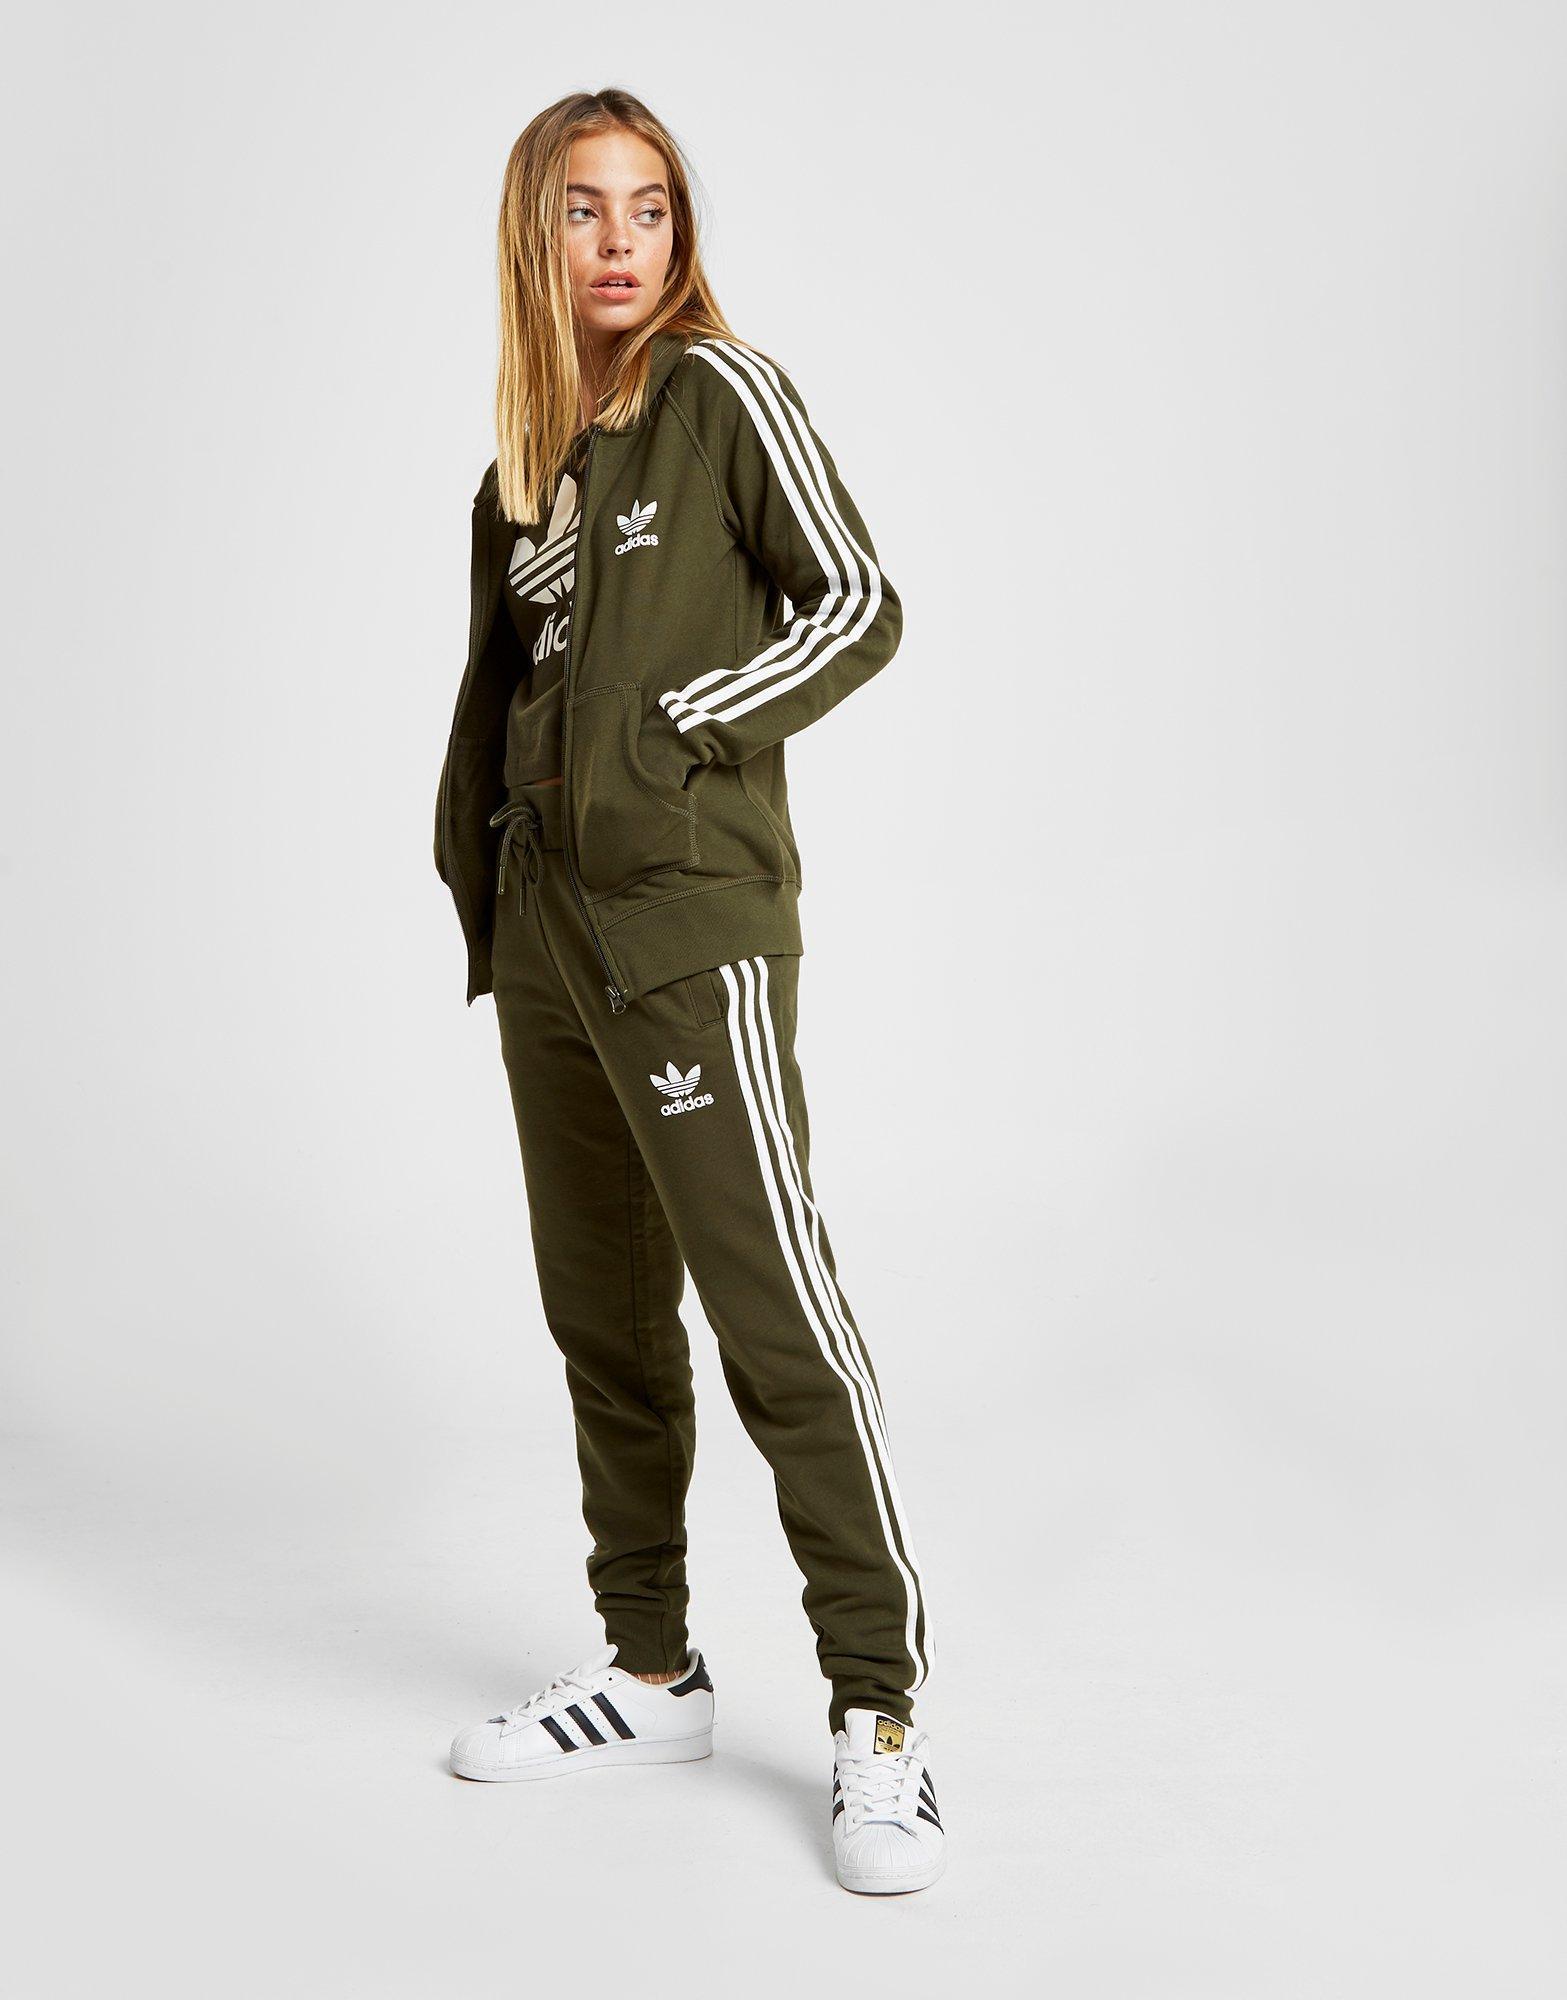 b53b296e Adidas Originals Green 3-stripes California Full Zip Hoodie